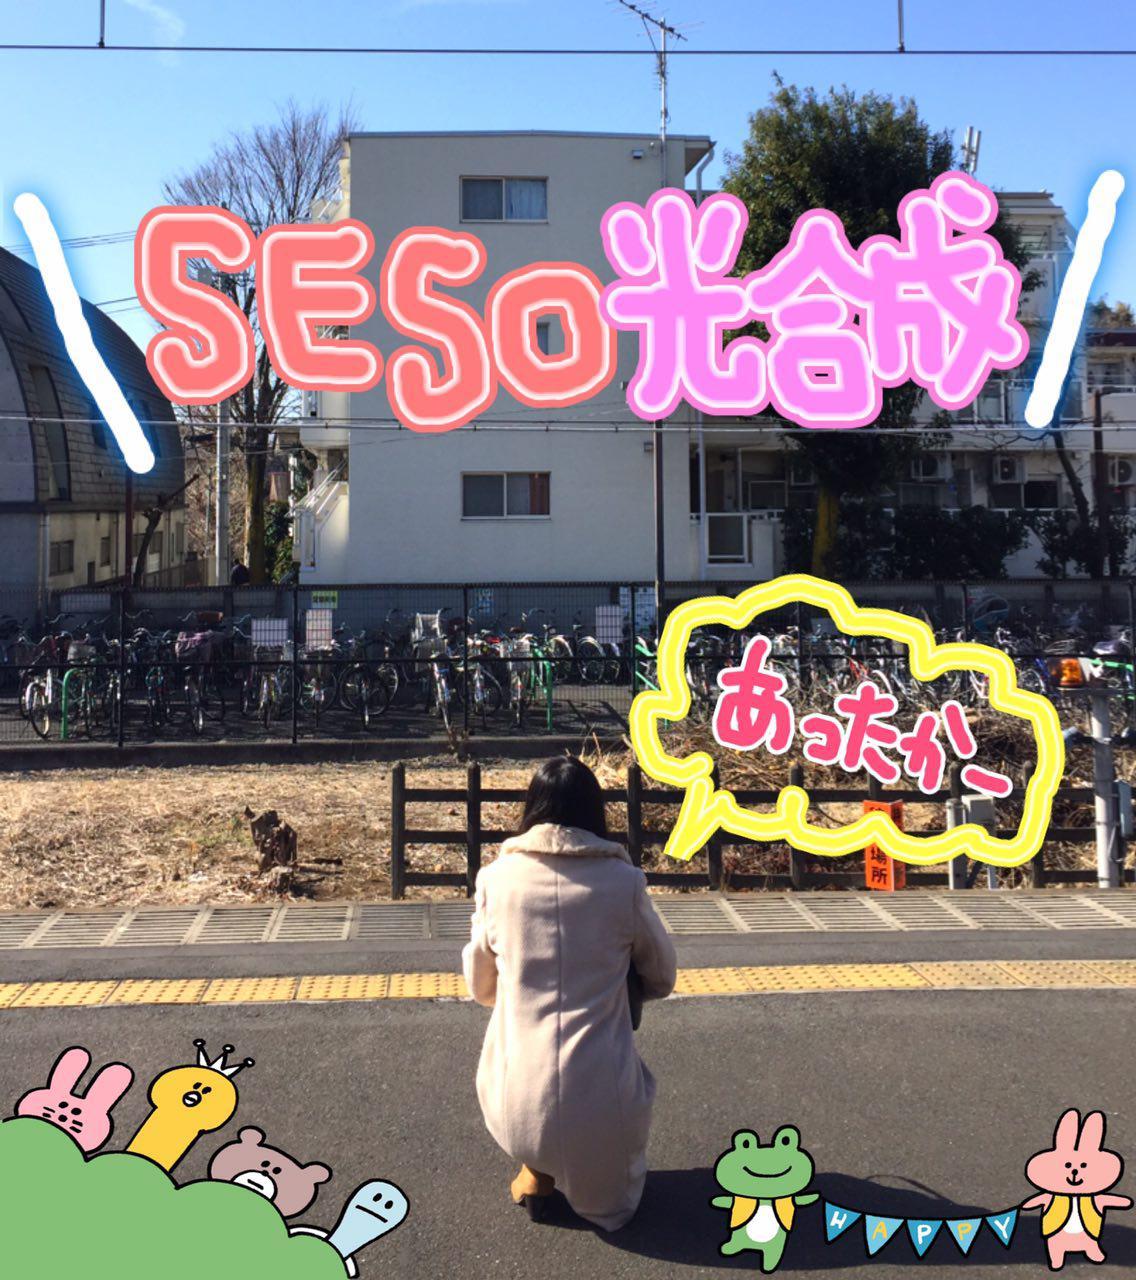 photo_2017-02-08_22-54-40.jpg